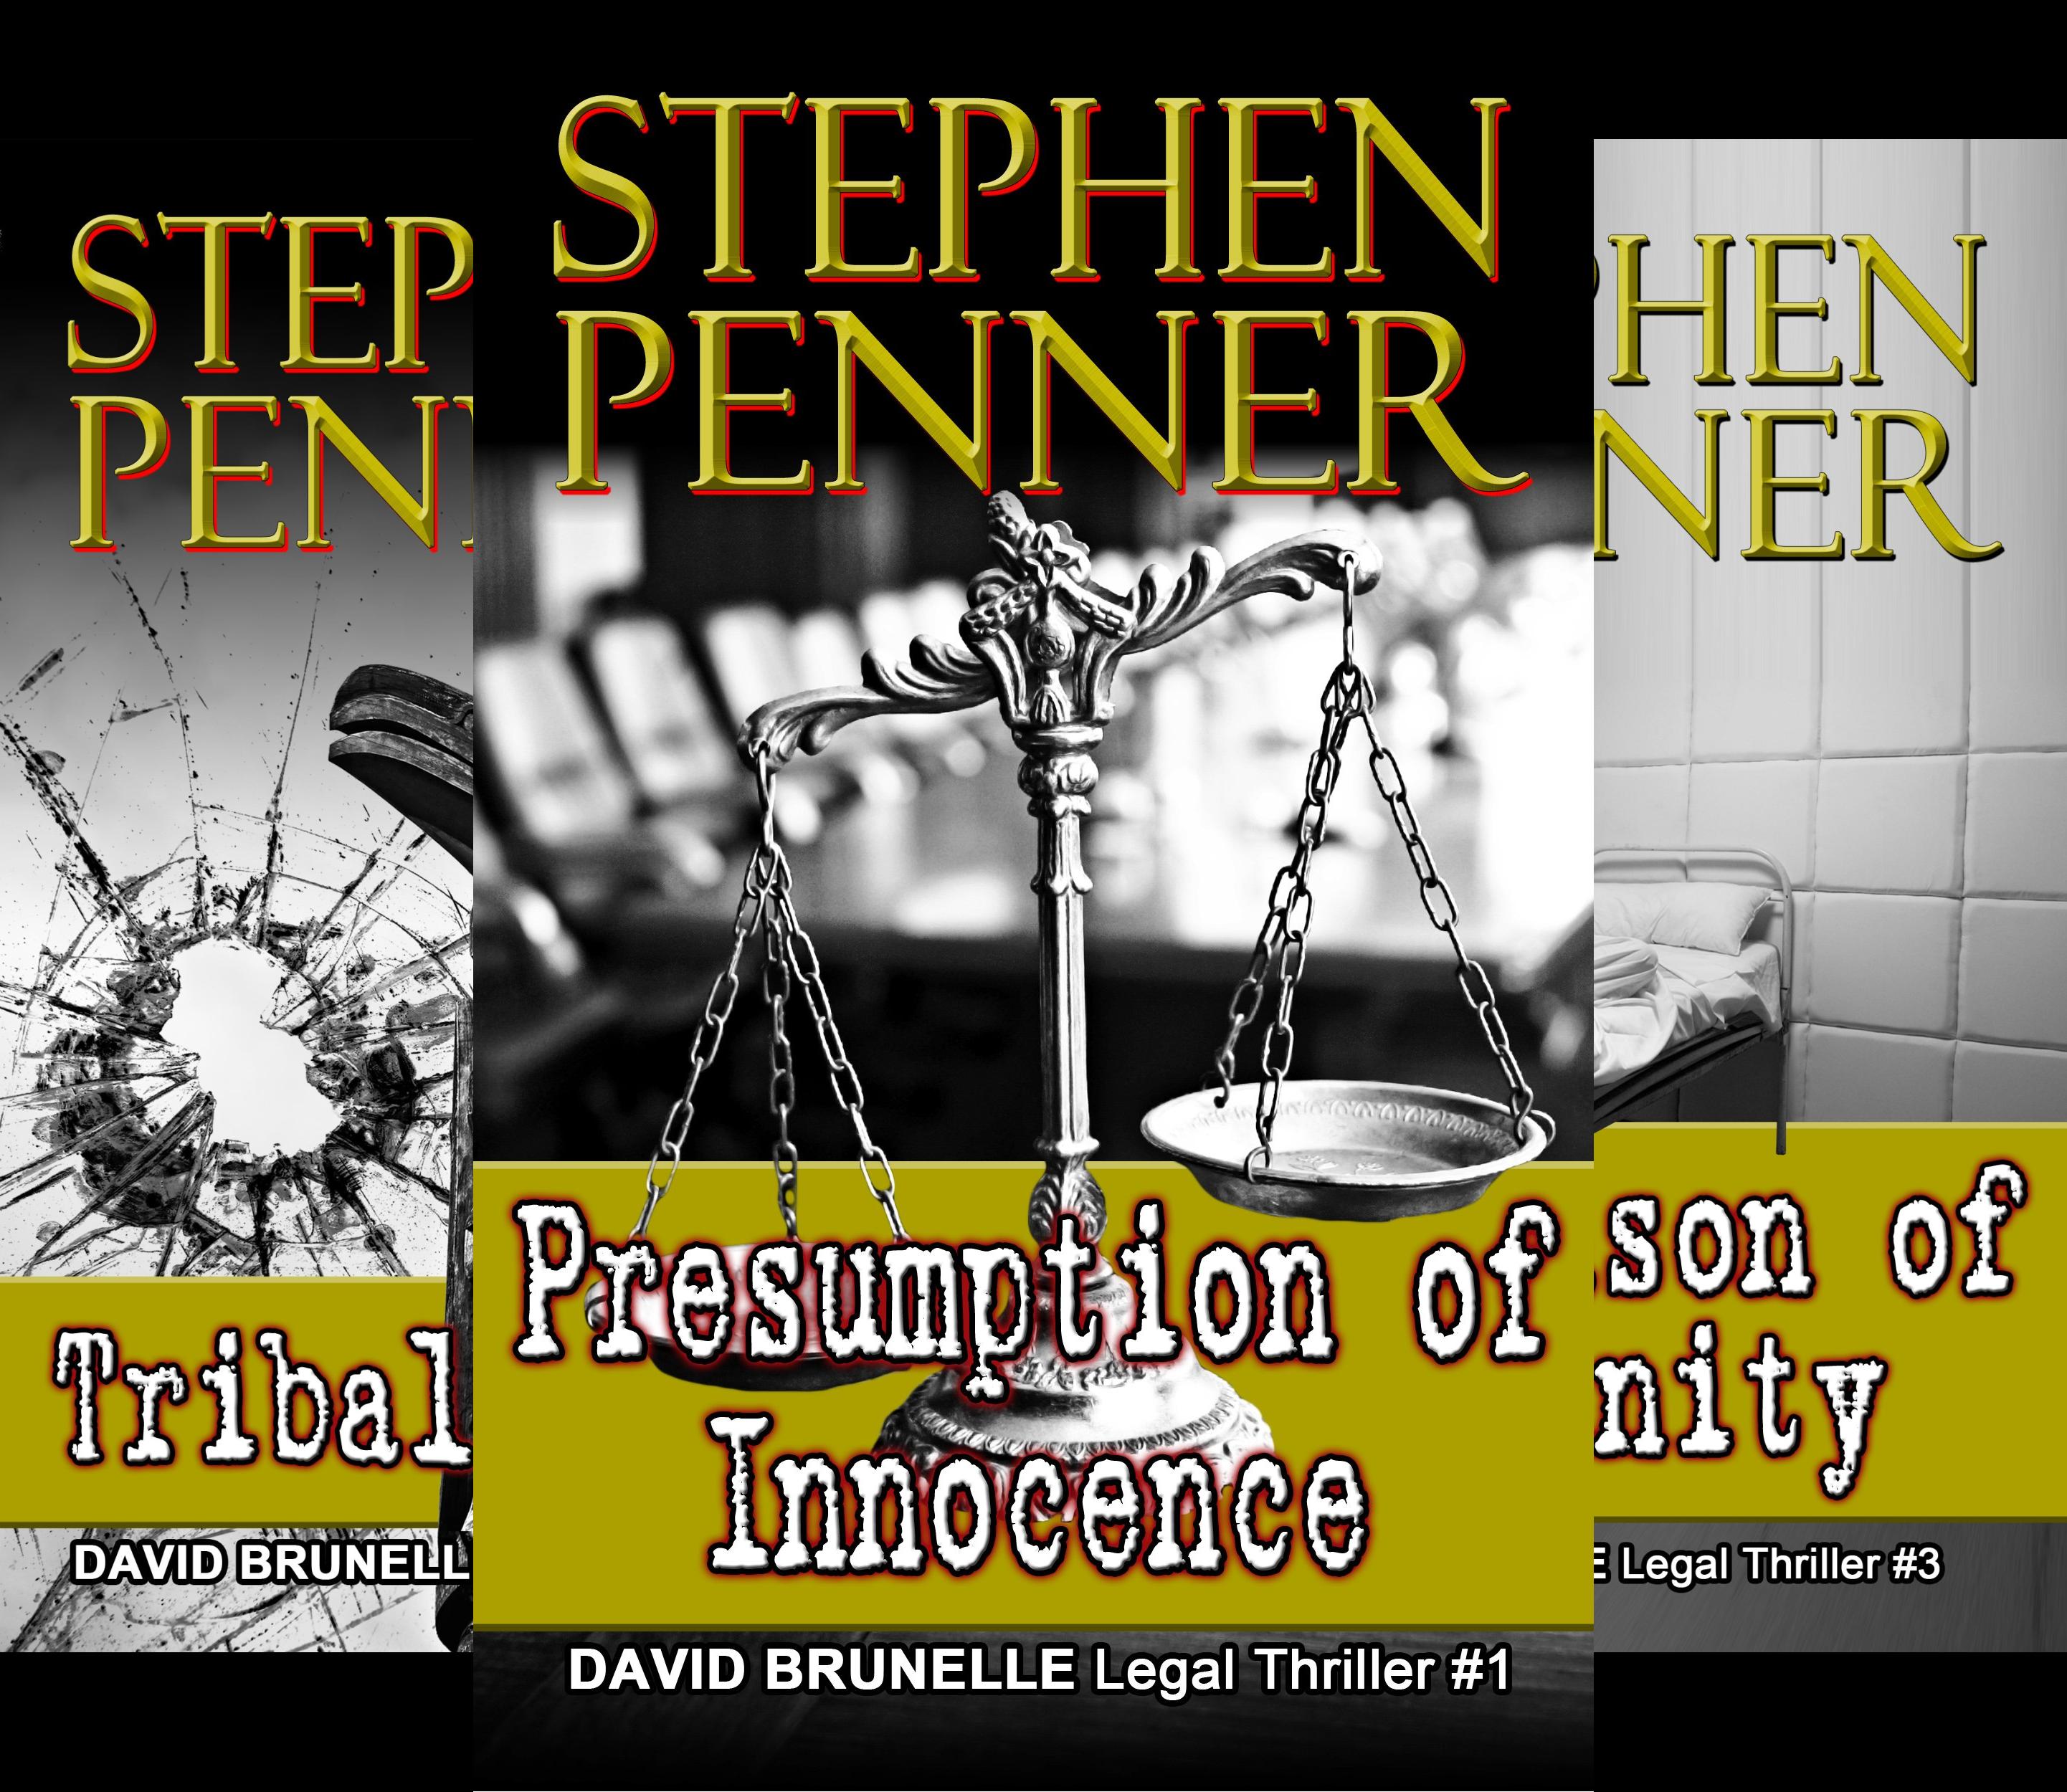 David Brunelle Legal Thriller Series (8 Book Series)